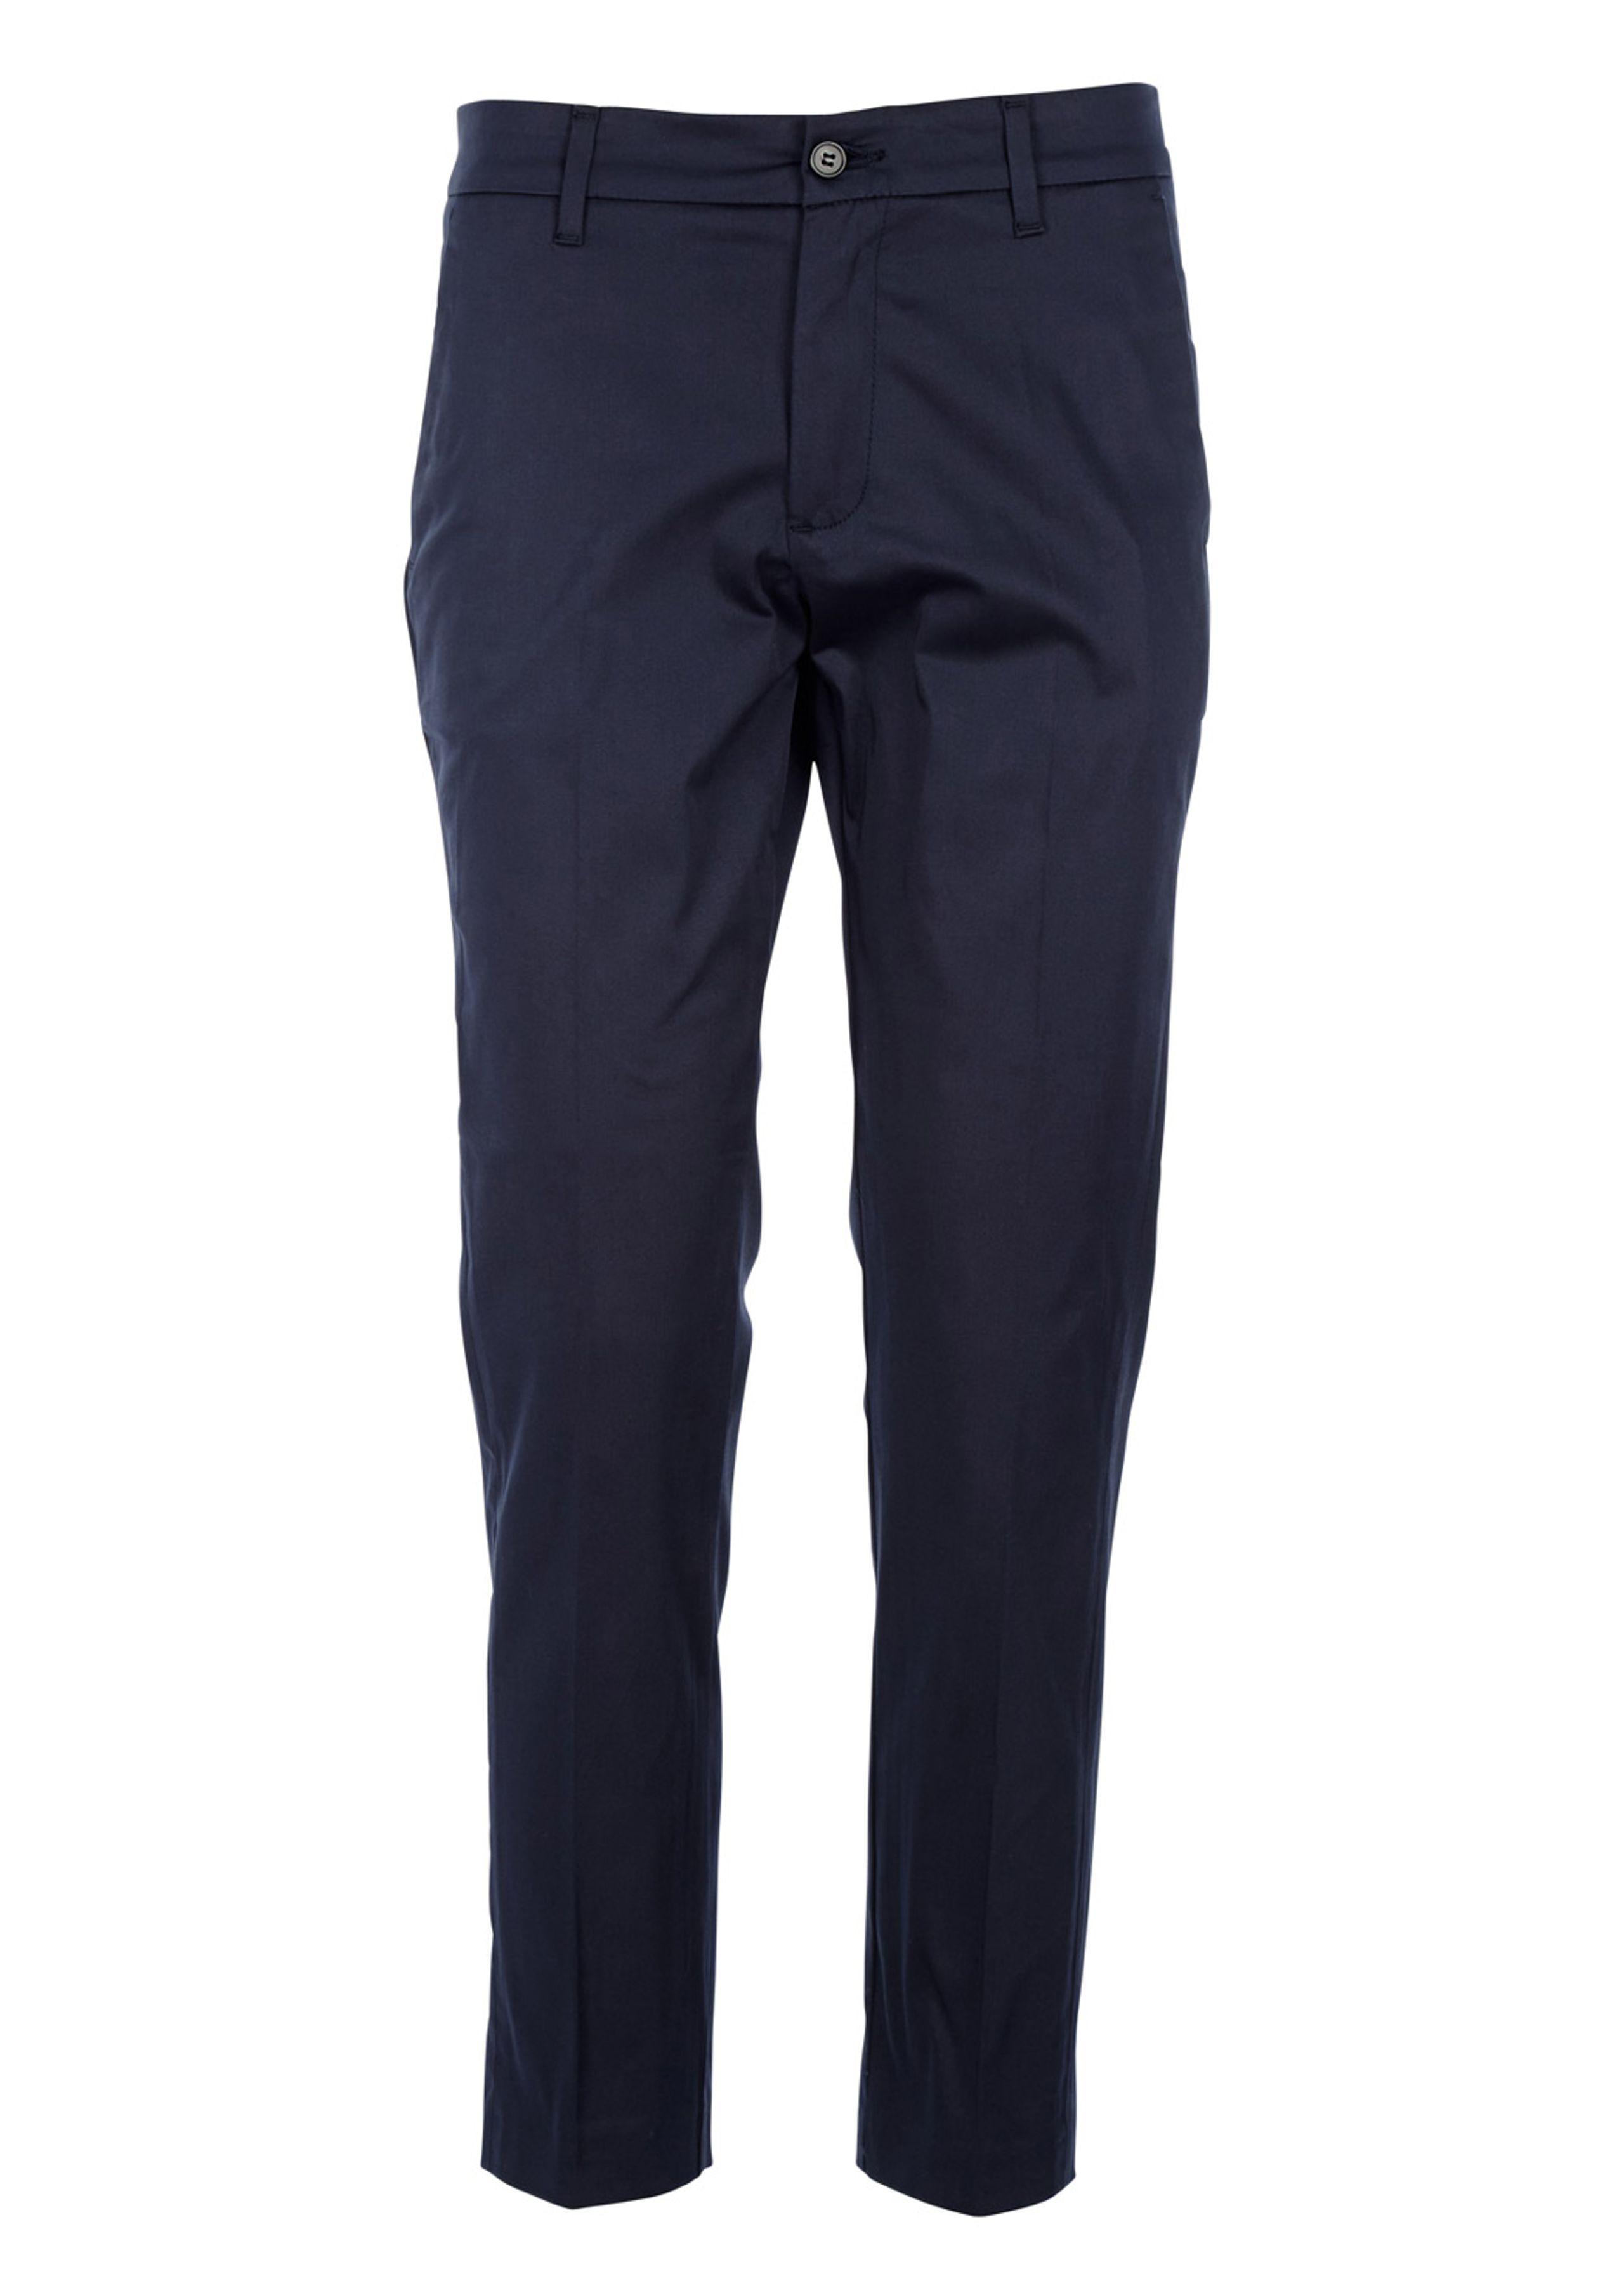 Clear trouser